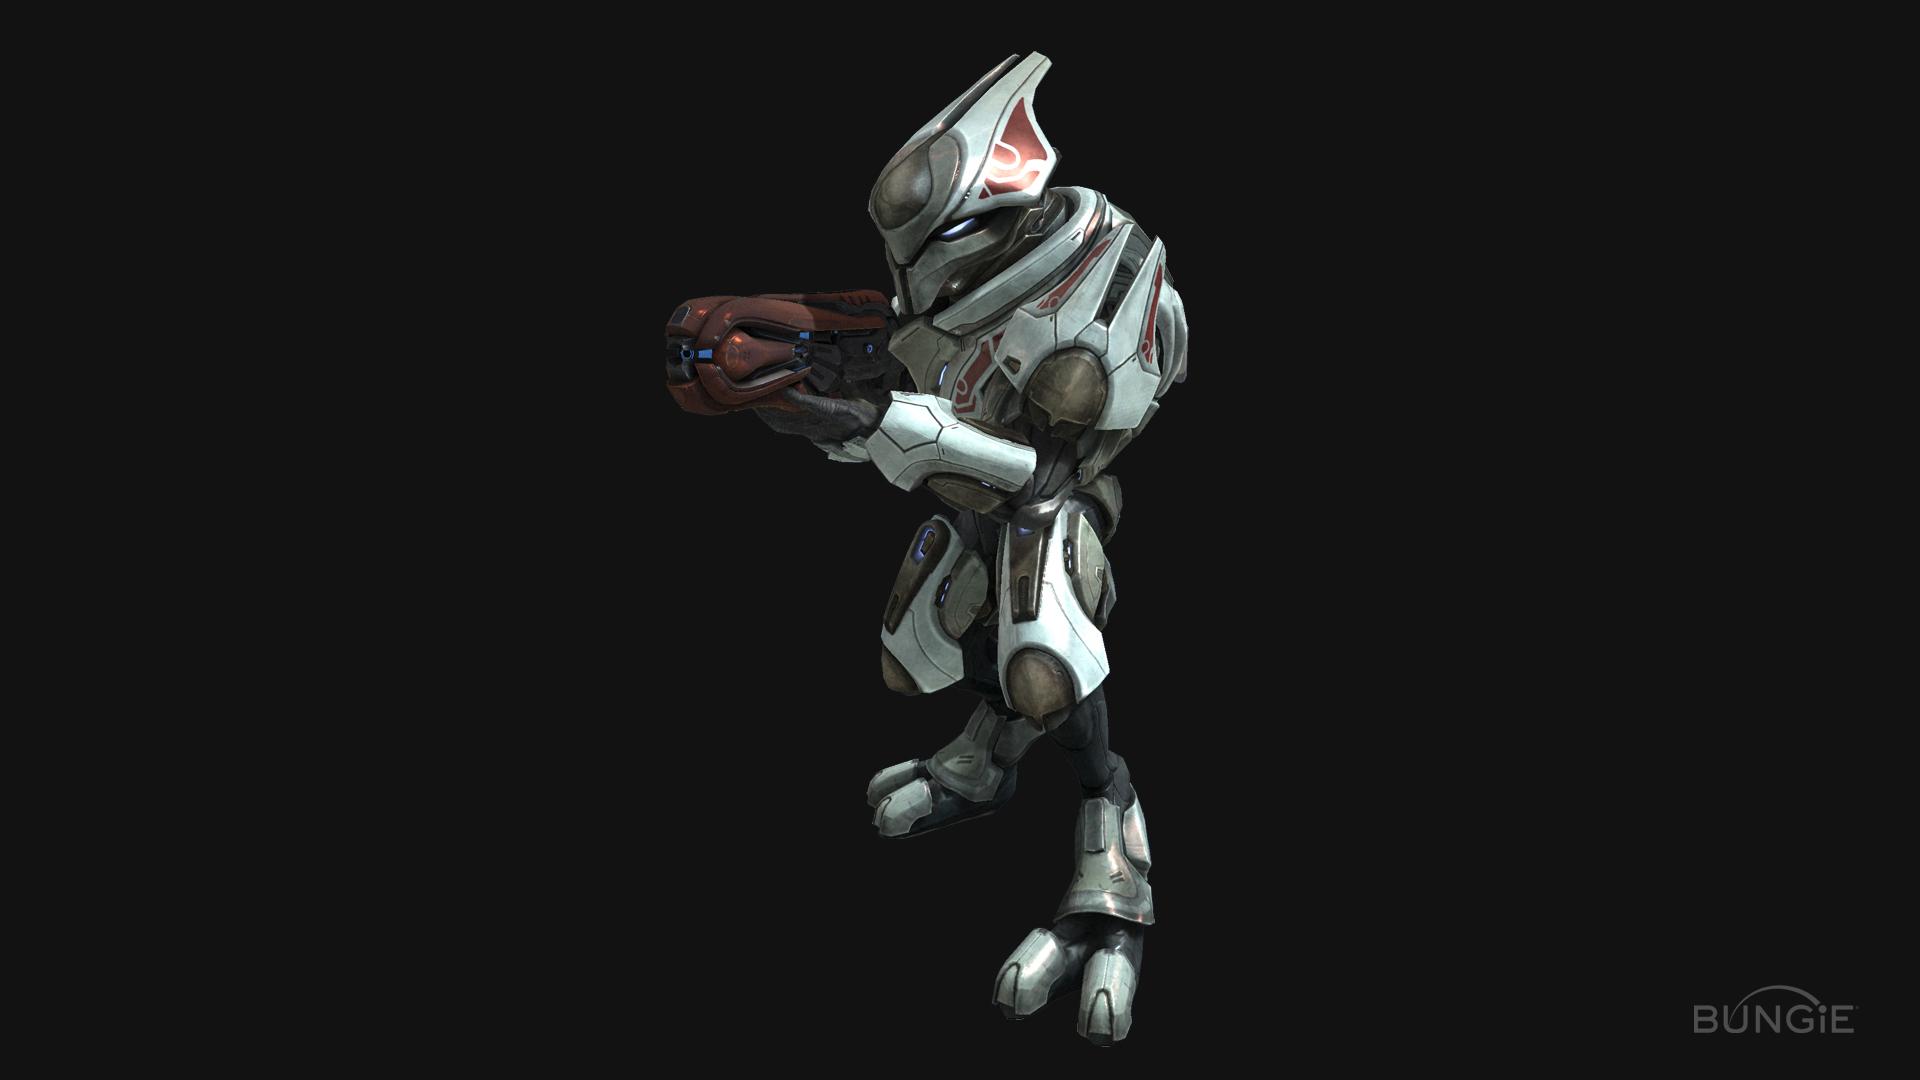 Halo Reach Elite Ultra Wallpaper